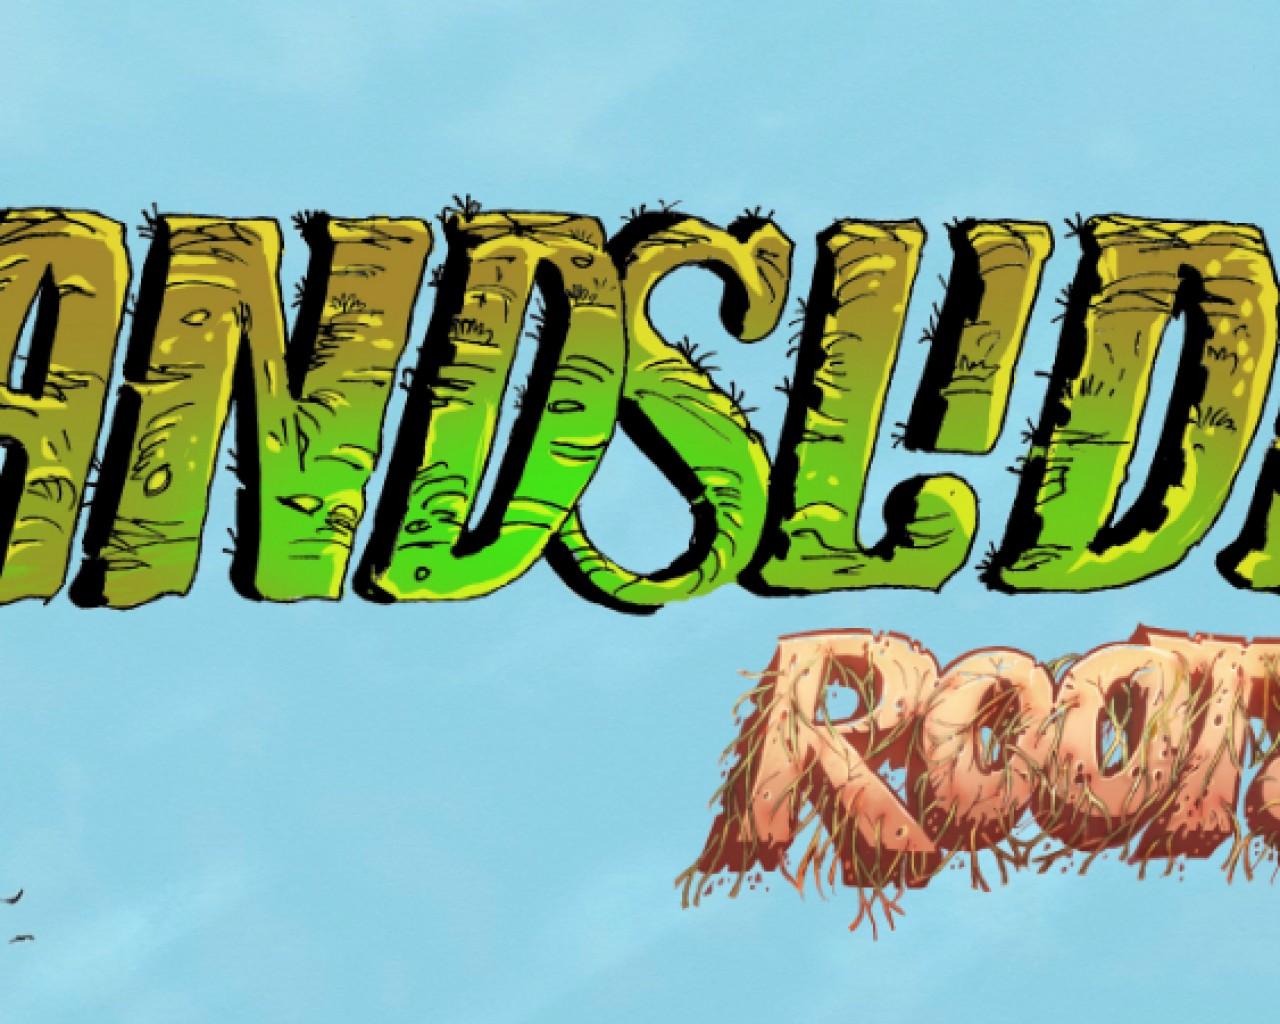 Preview Image 1 for Landslide Roots